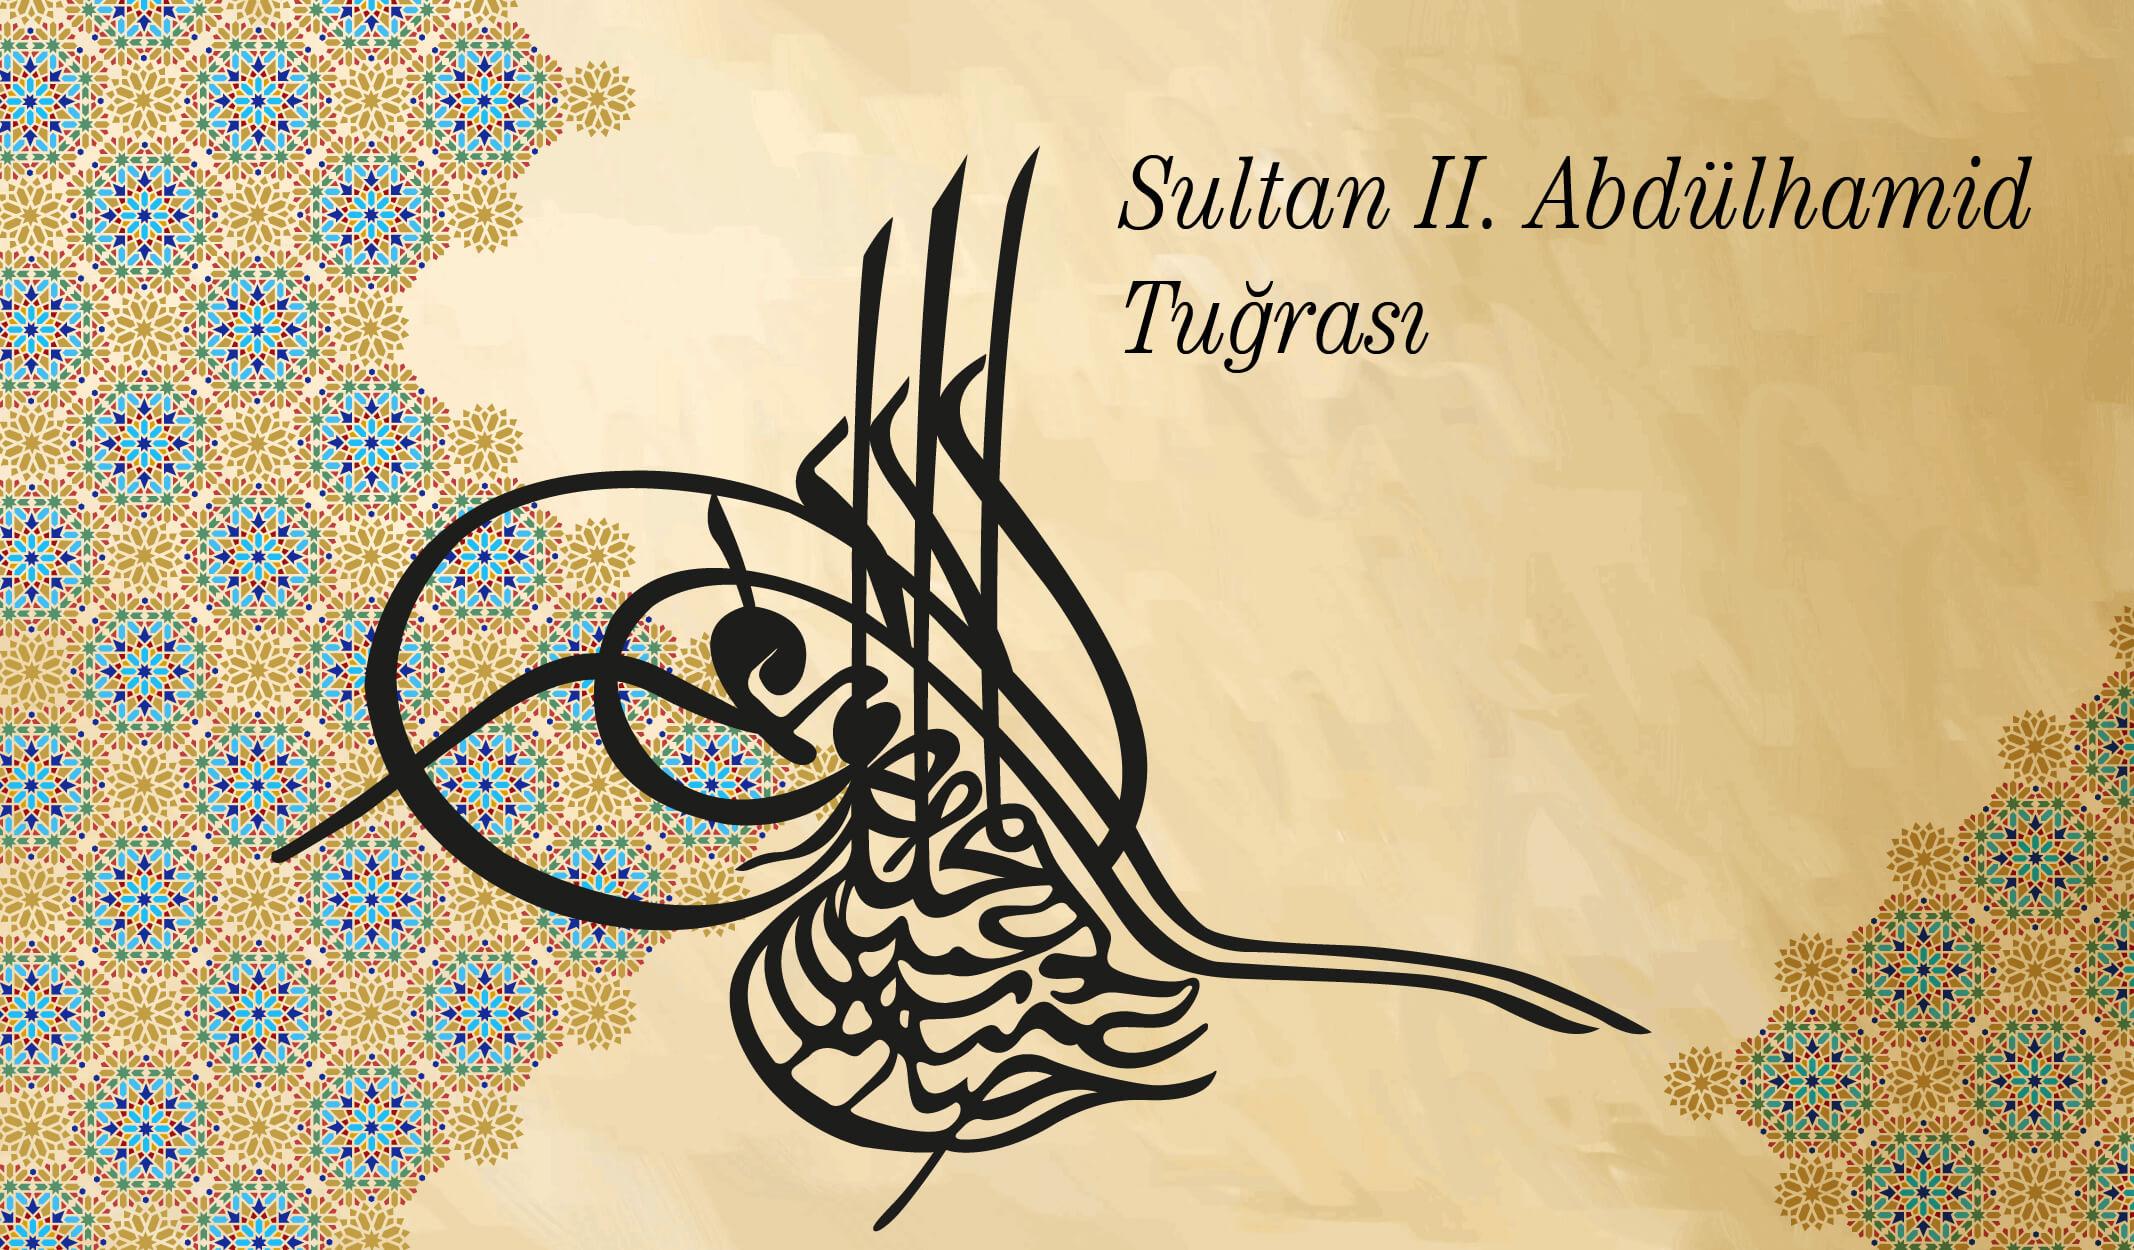 sultan ikinci aldülhamit tuğrası